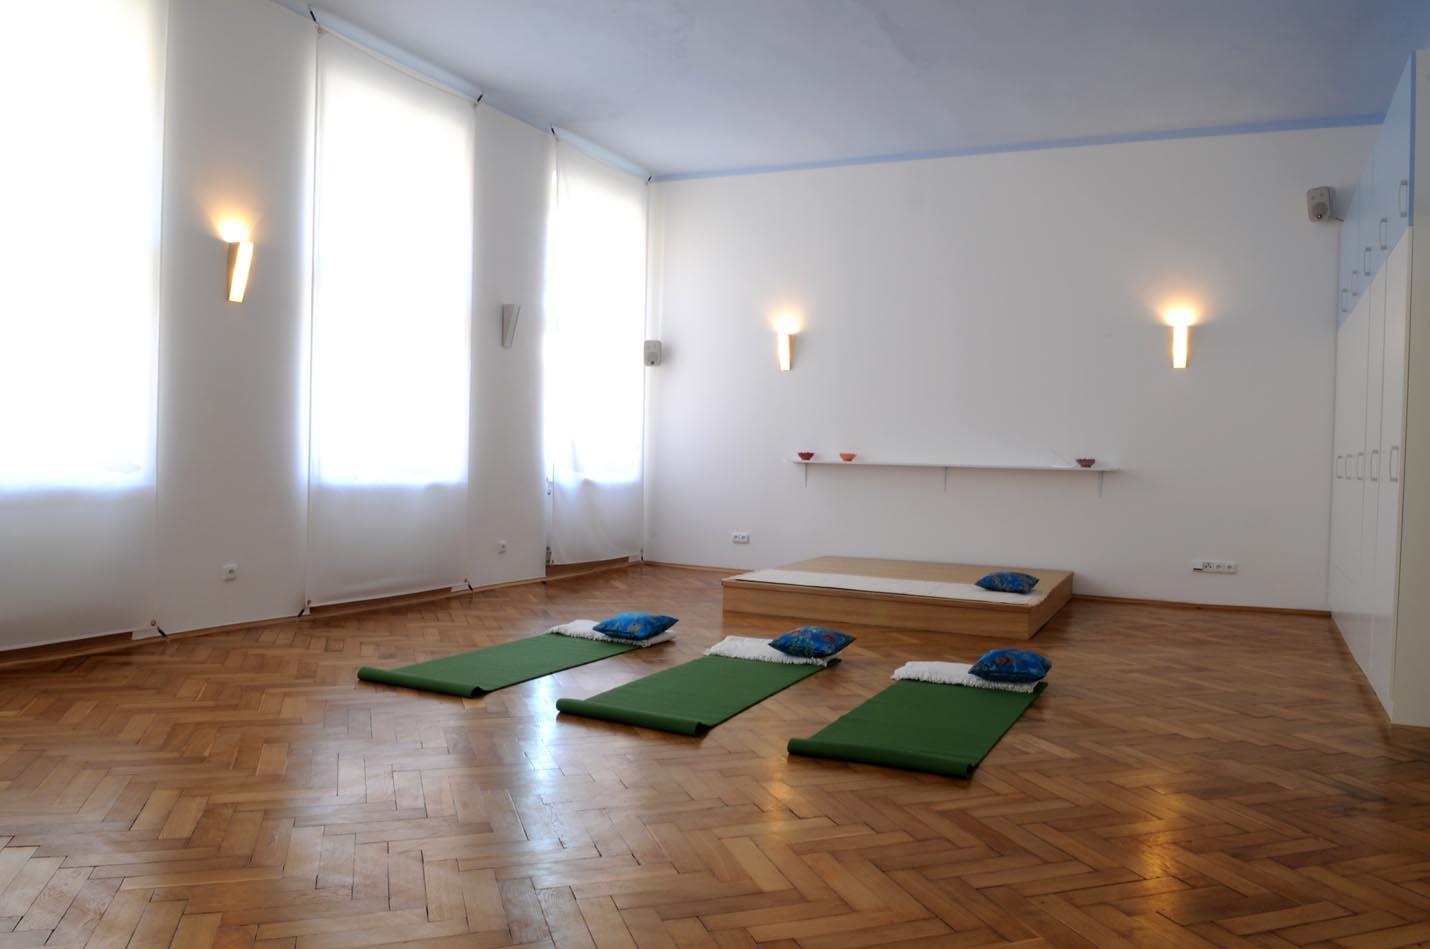 Yoga studio in centre of prague for Small yoga room ideas